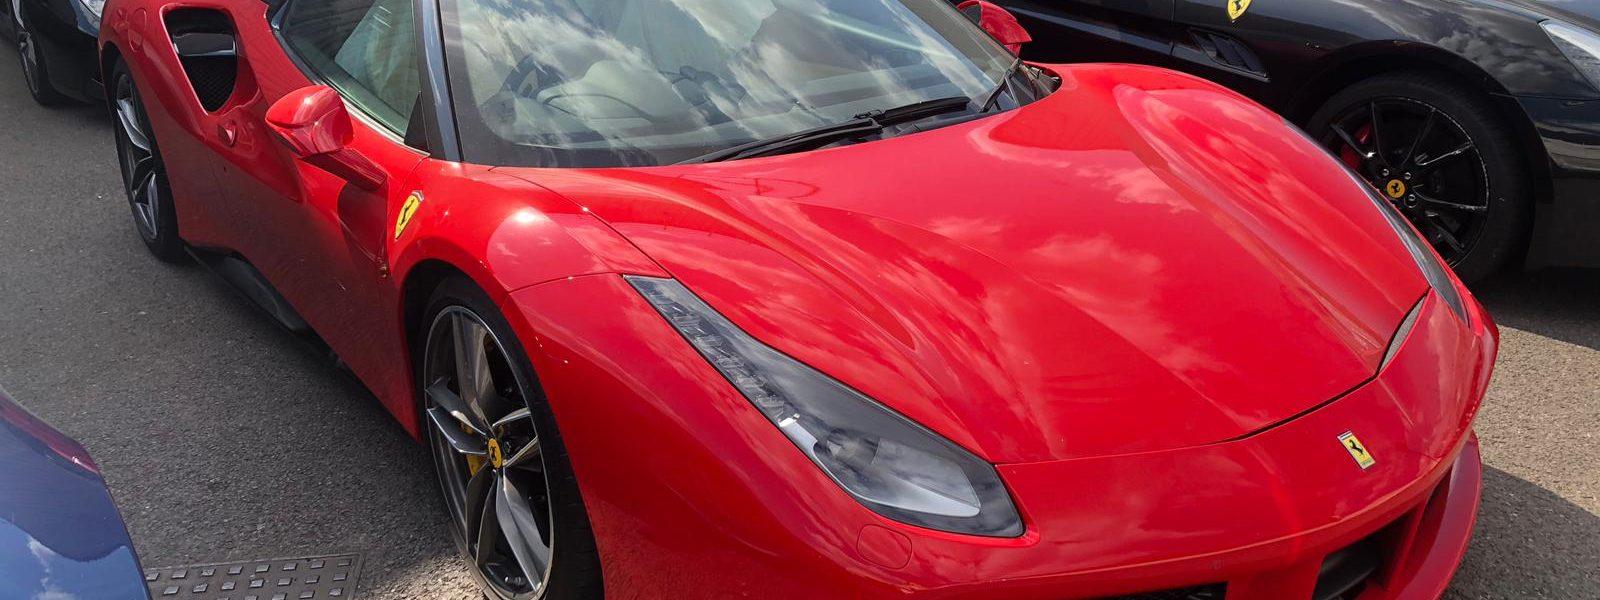 Ferrari 488 Spider – The Final 10%…